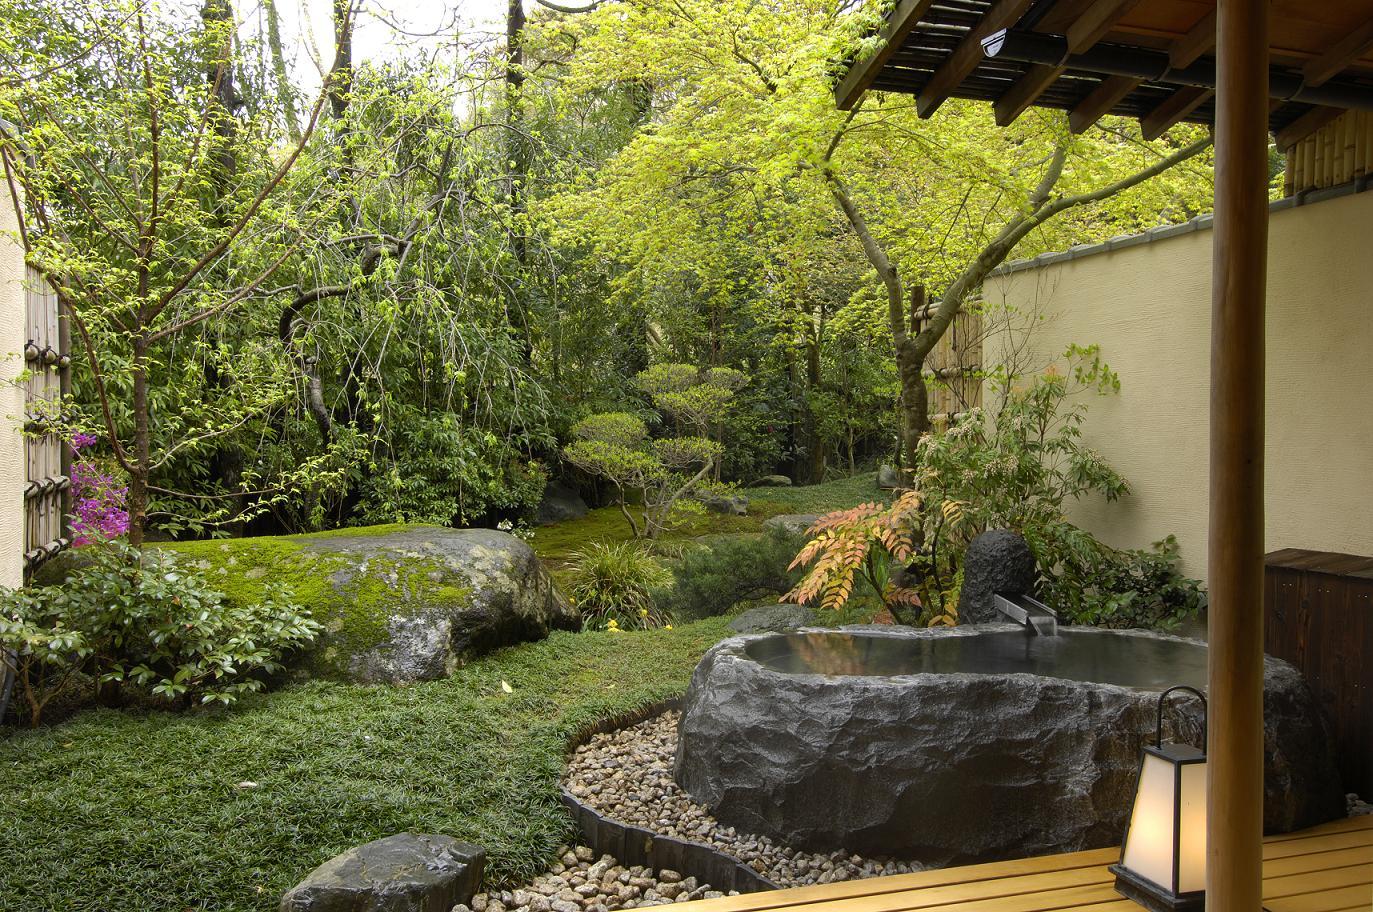 Mon plus beau voyage au japon hakone gora kadan ryokan for Le jardin zen